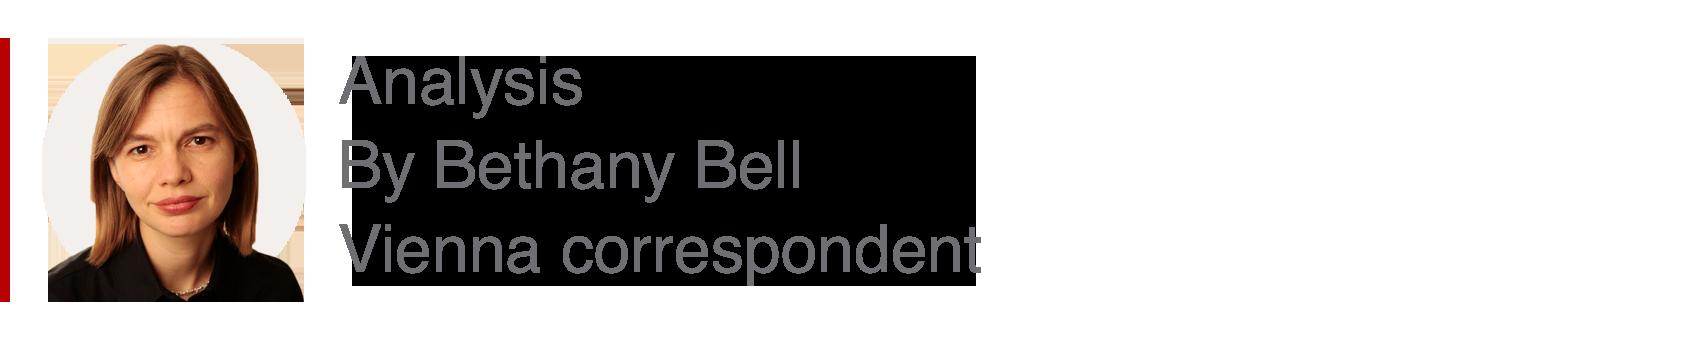 Analysis box by Bethany Bell, Vienna correspondent